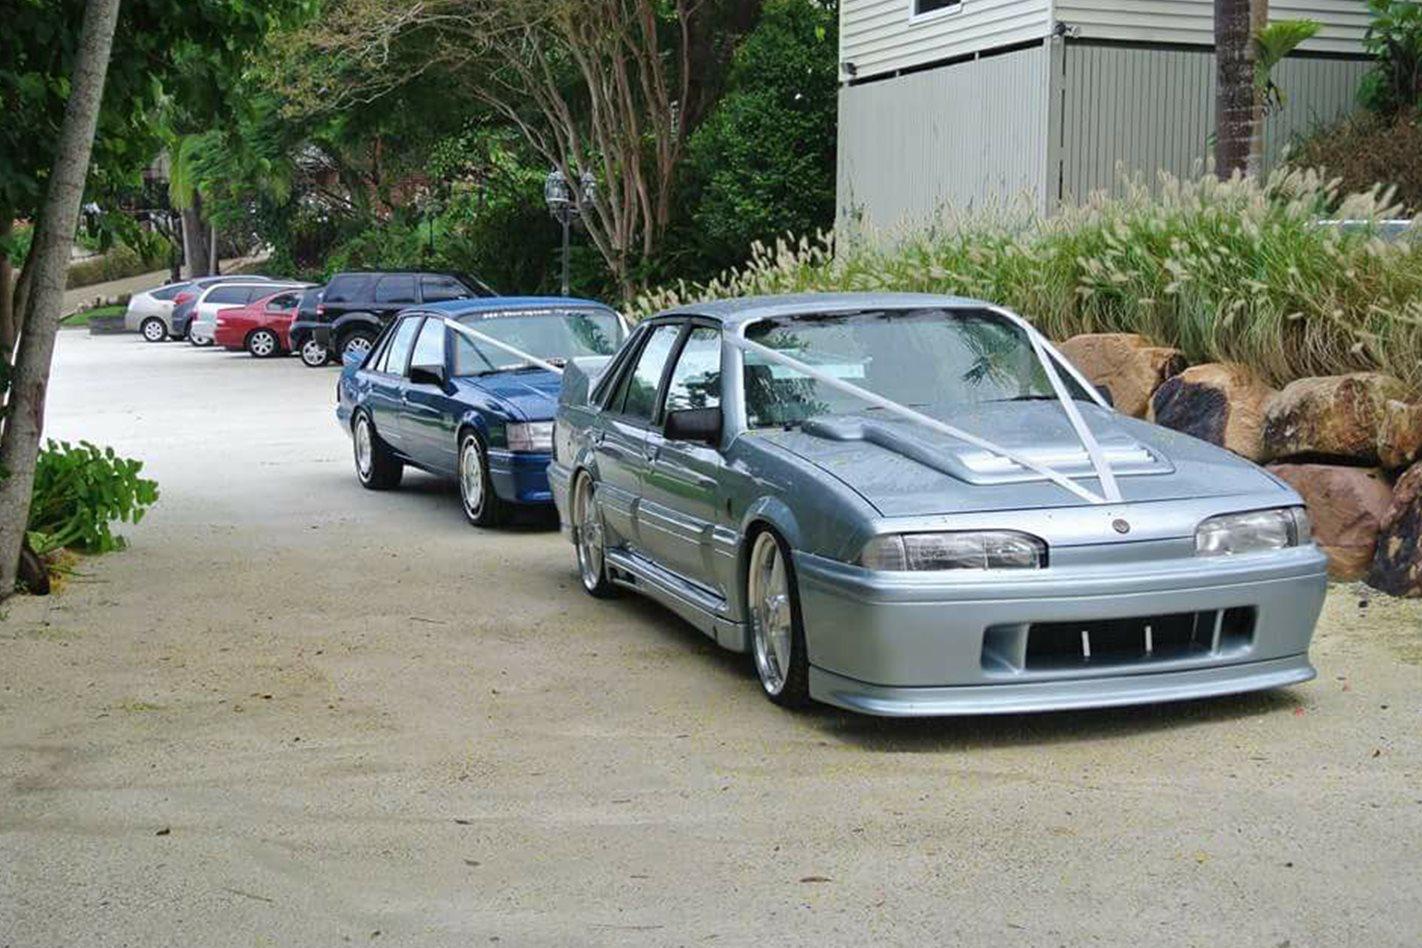 C Jemma N Rusty's wedding cars